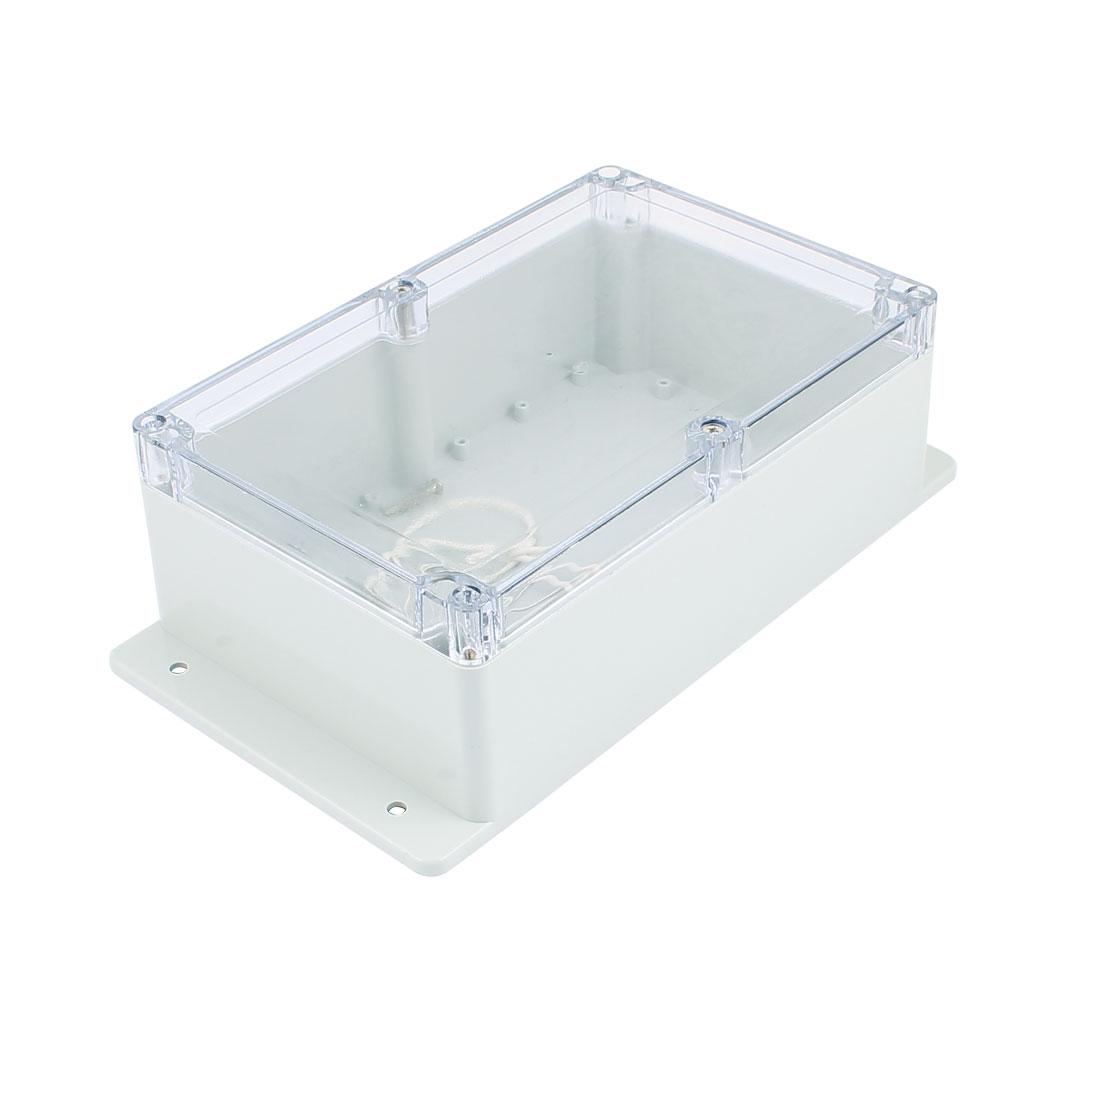 Dustproof IP65 Junction Box DIY Terminal Connect Enclosure Adaptable 222mm x 142mm x 78mm